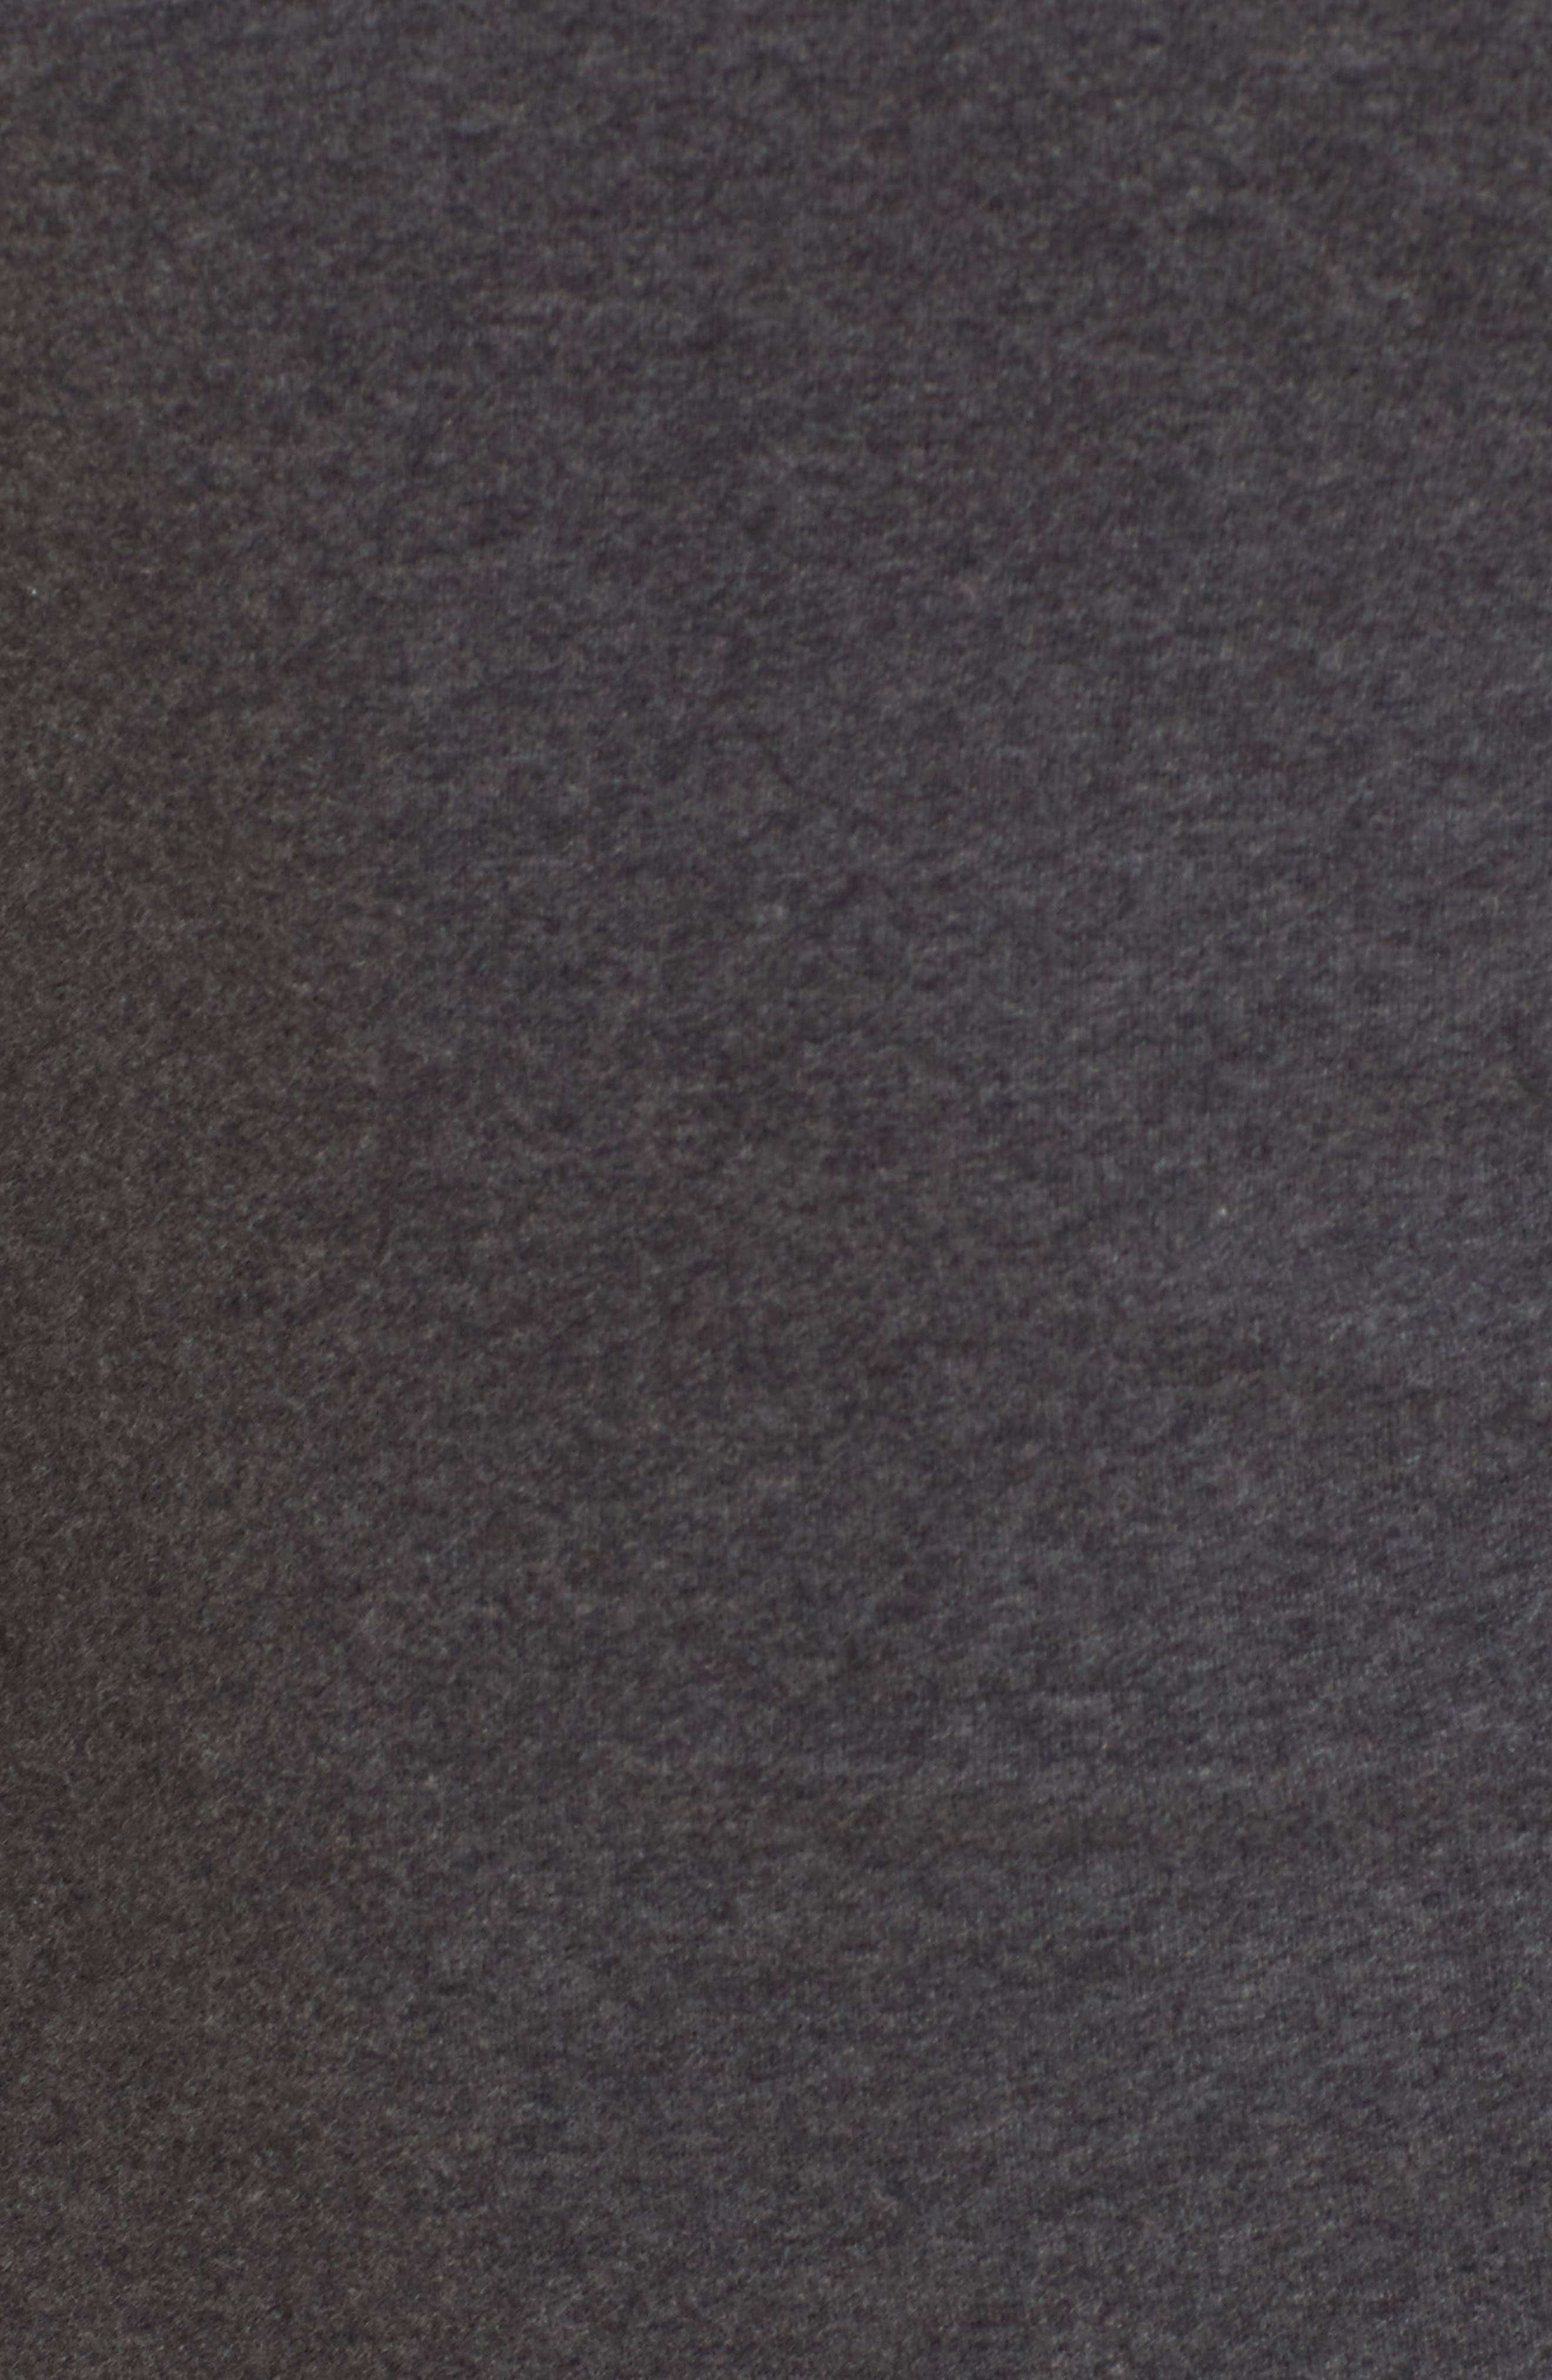 Scoop Back Knit Dress,                             Alternate thumbnail 10, color,